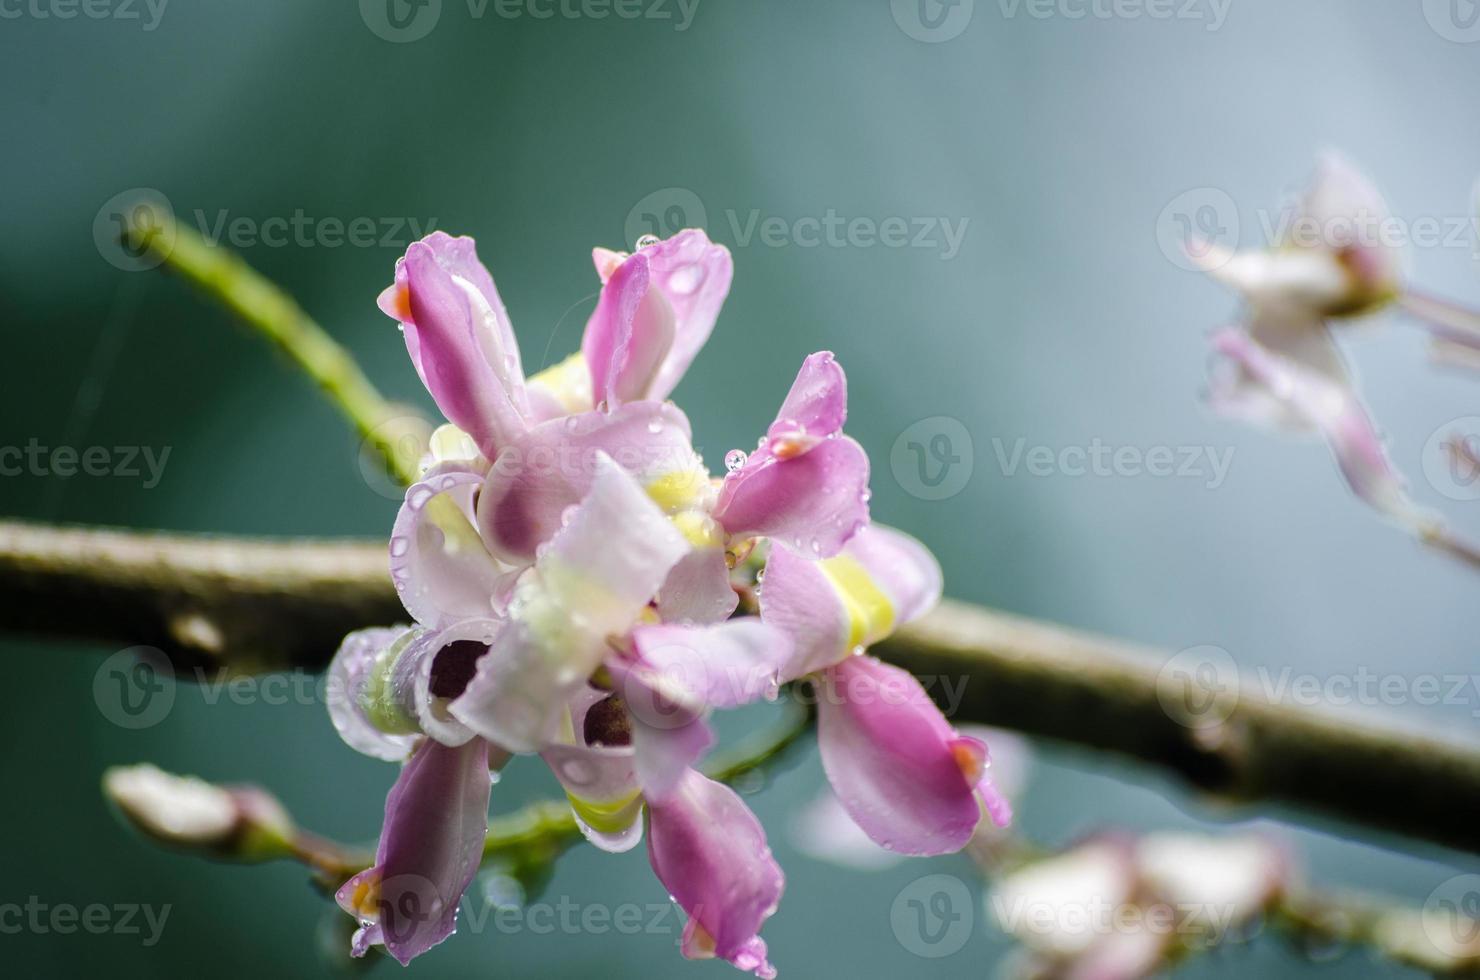 blomma madre de cacao foto